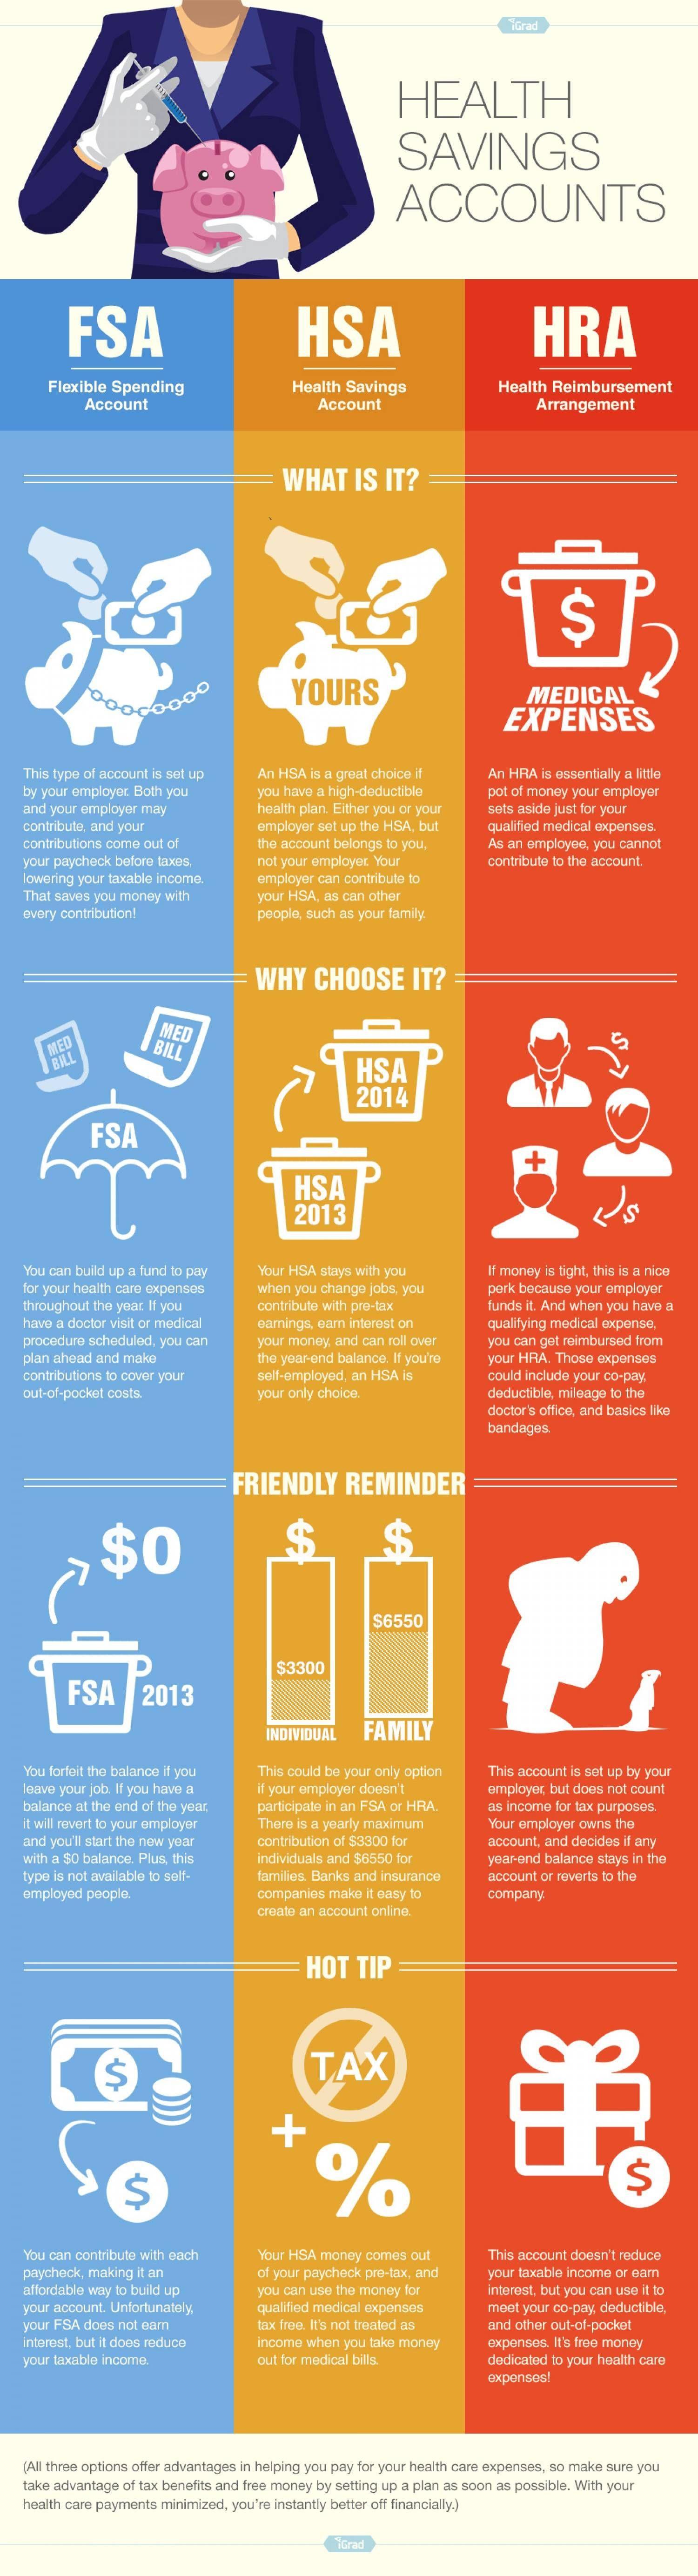 Health Savings Accounts Infographic  Latest